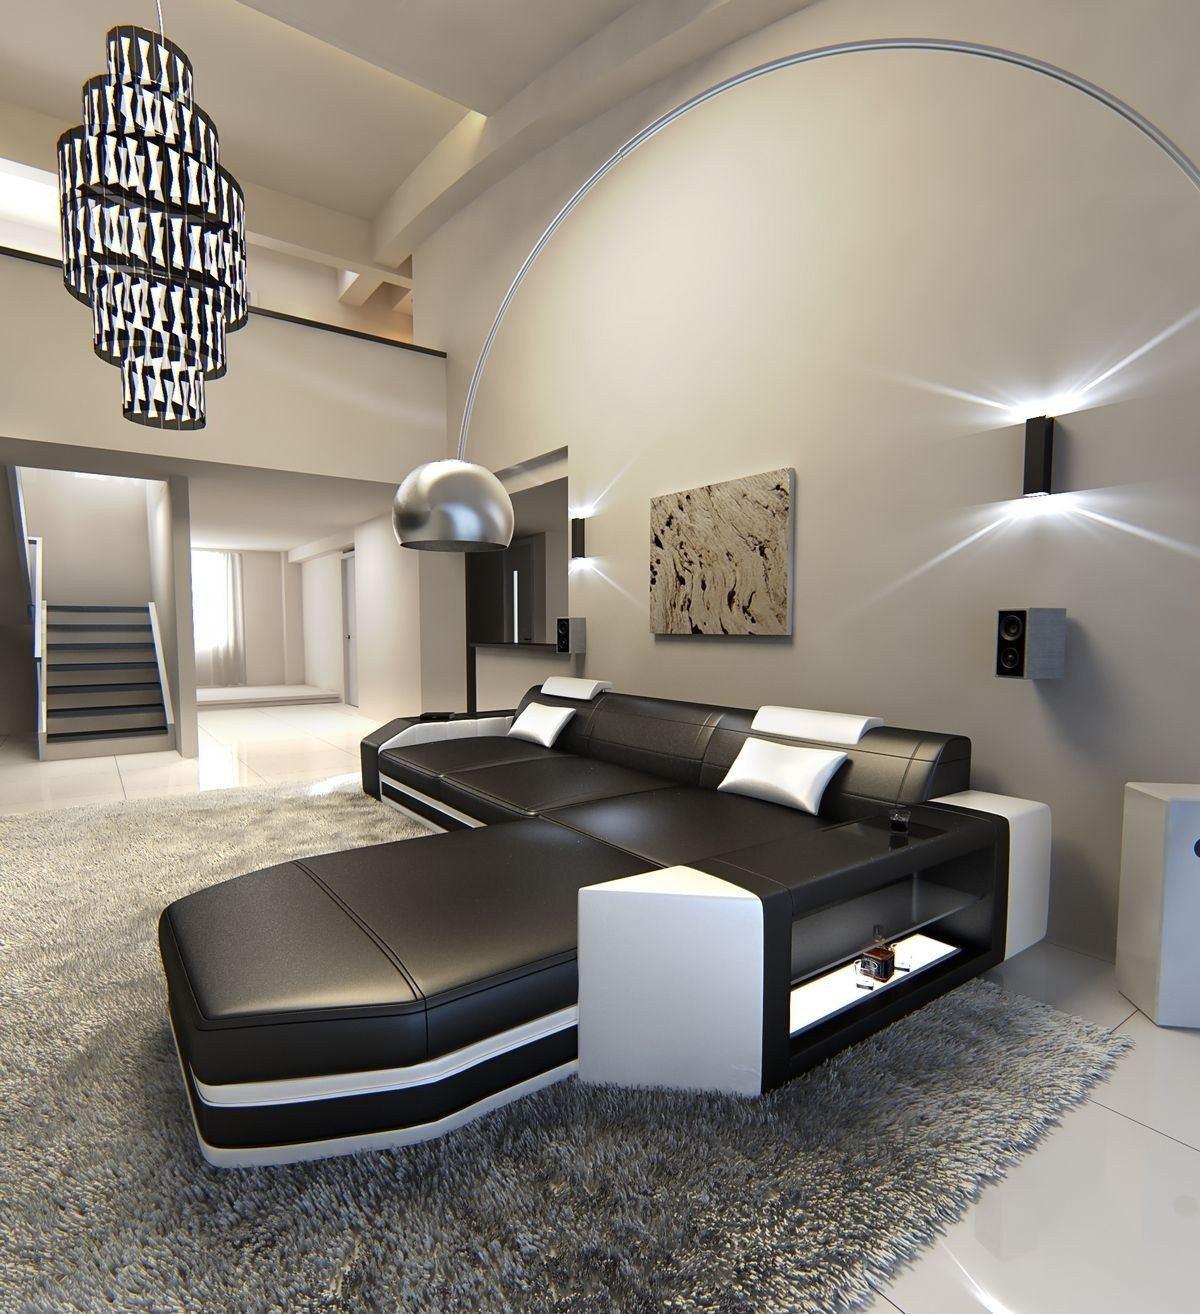 ledersofa prato l form in schwarz wei sofa mit kopfst tzen. Black Bedroom Furniture Sets. Home Design Ideas